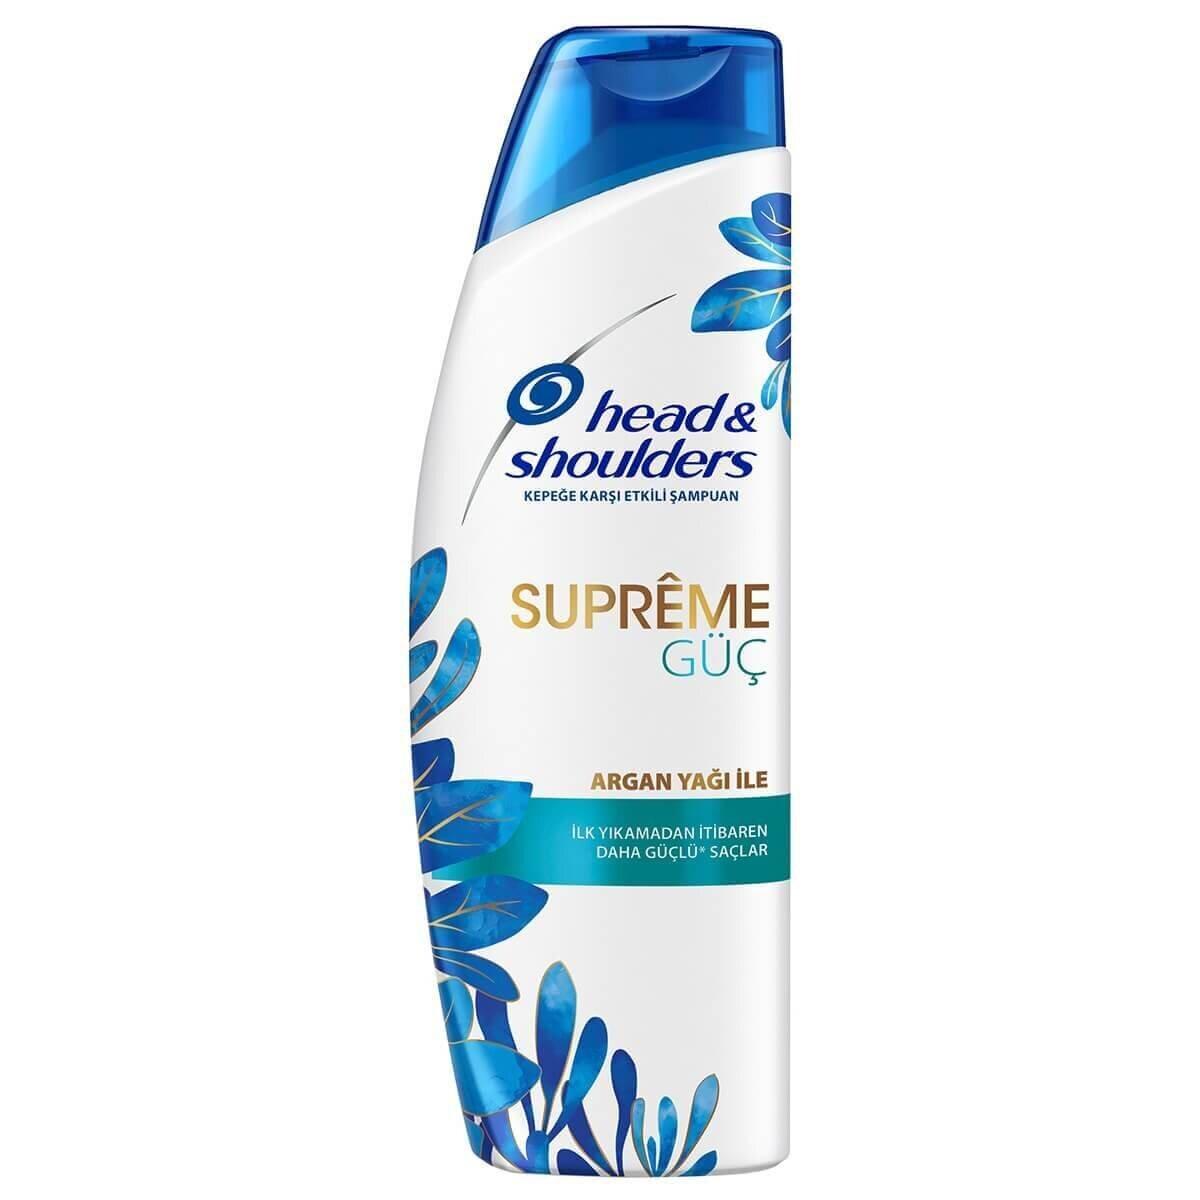 Güç Supreme Şampuan 300ml